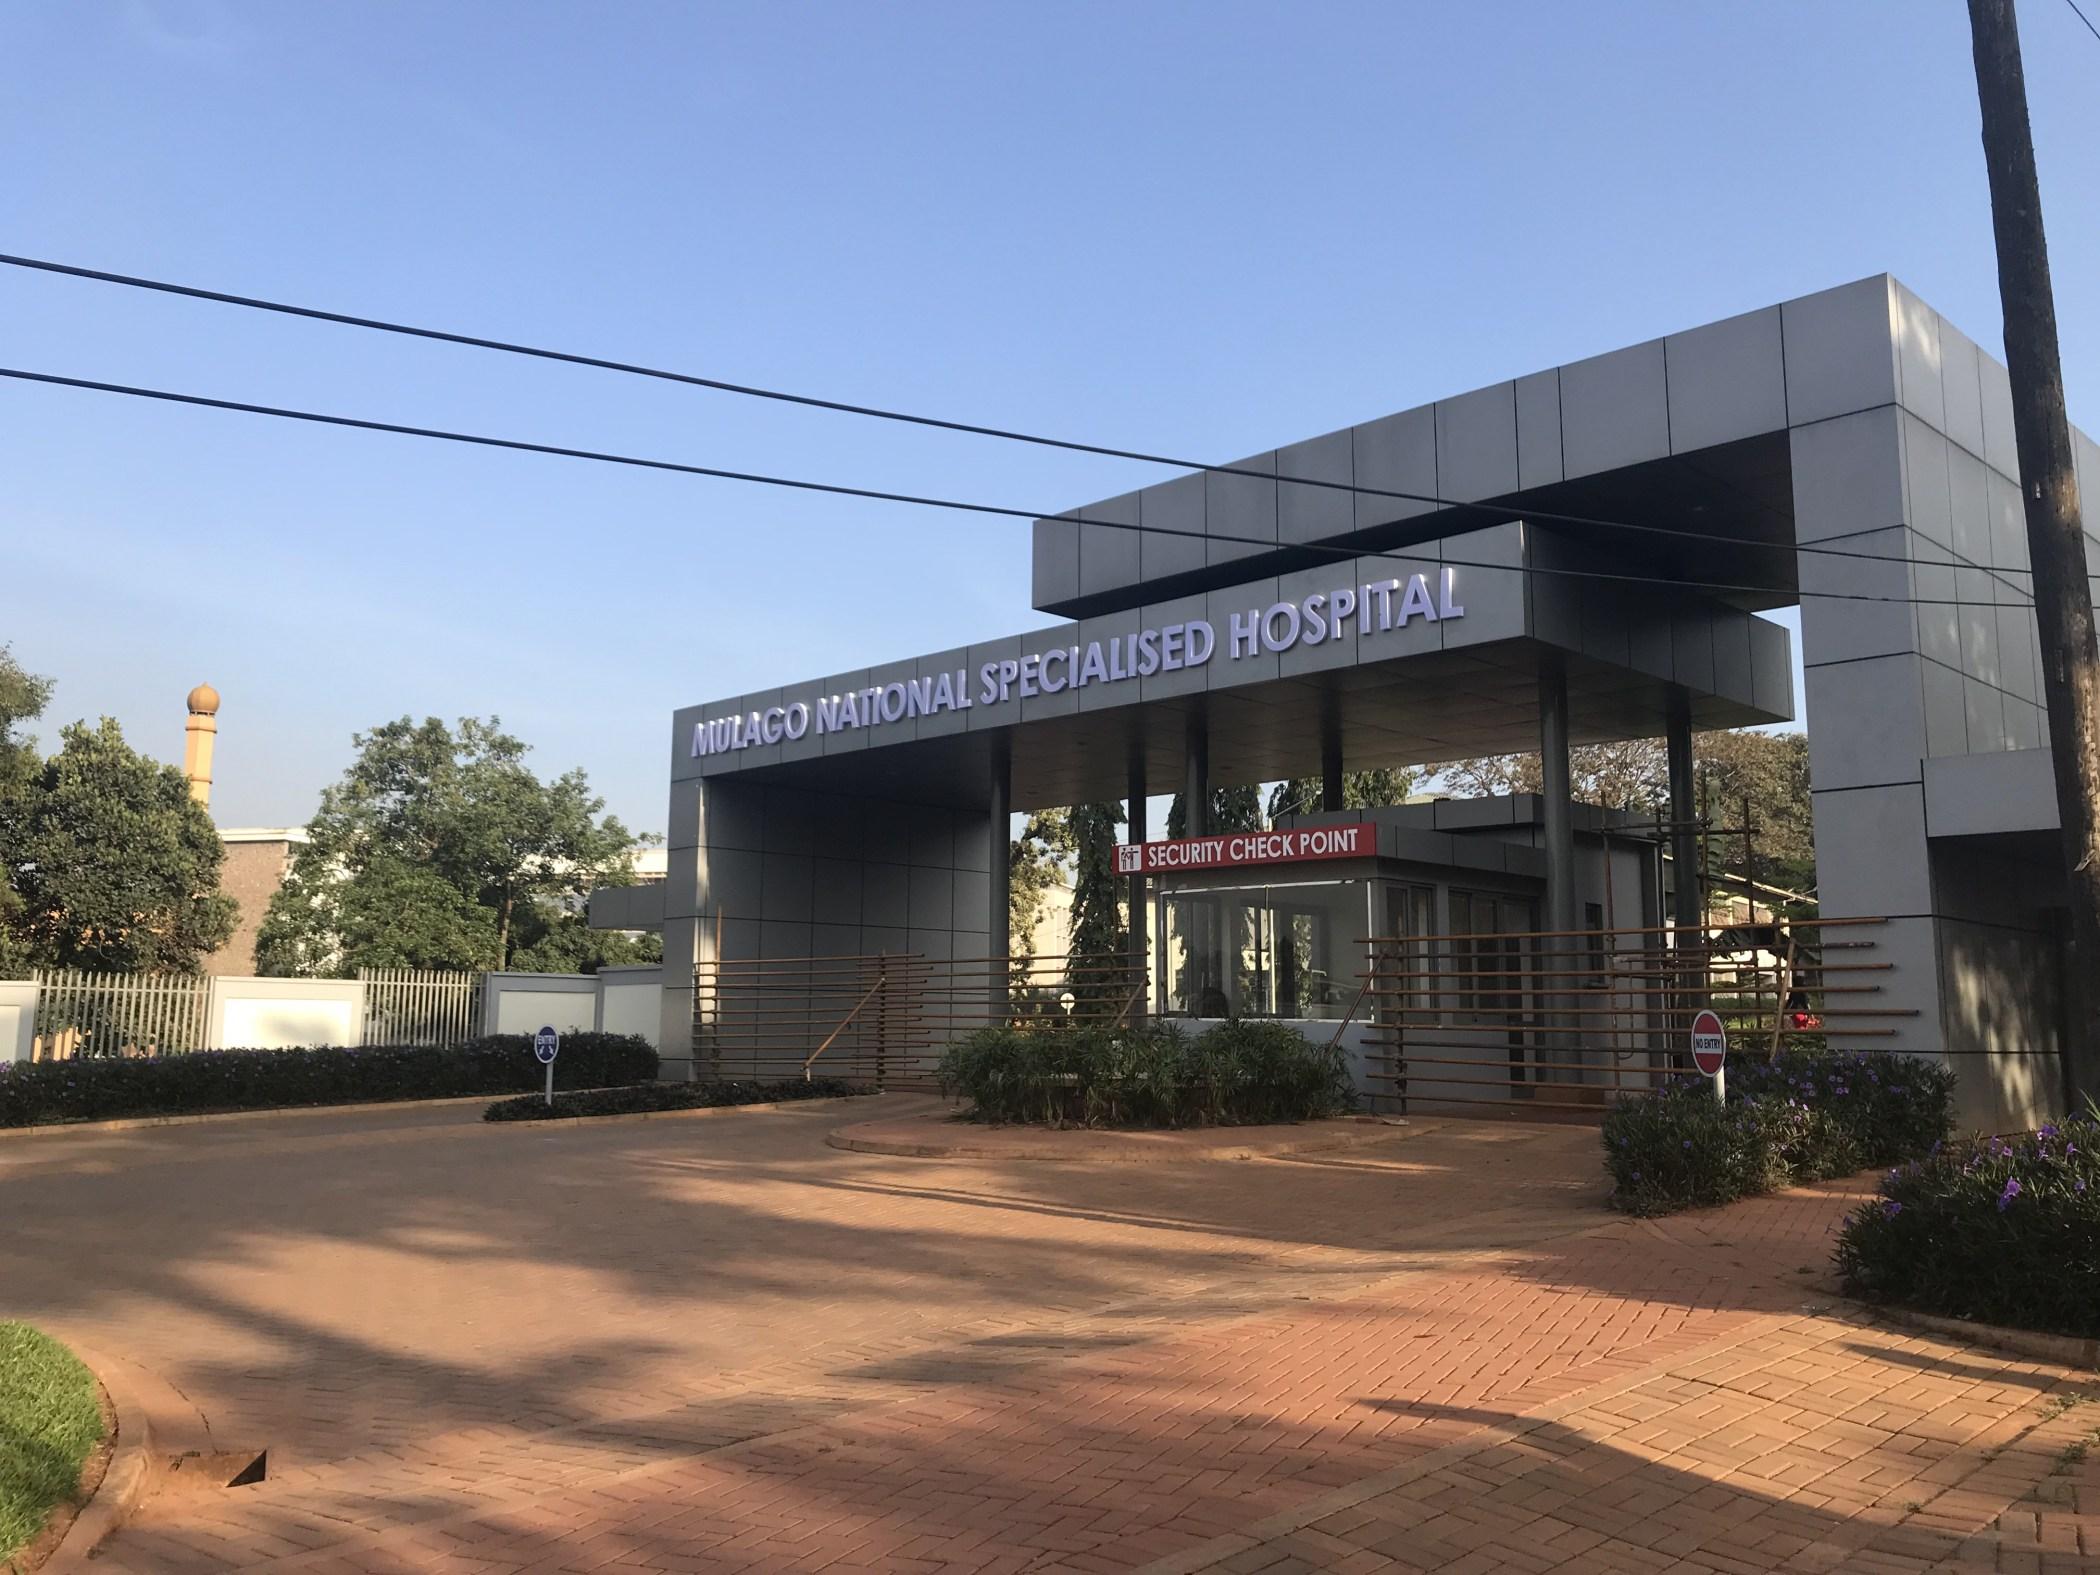 Hospital in Kampala, Uganda